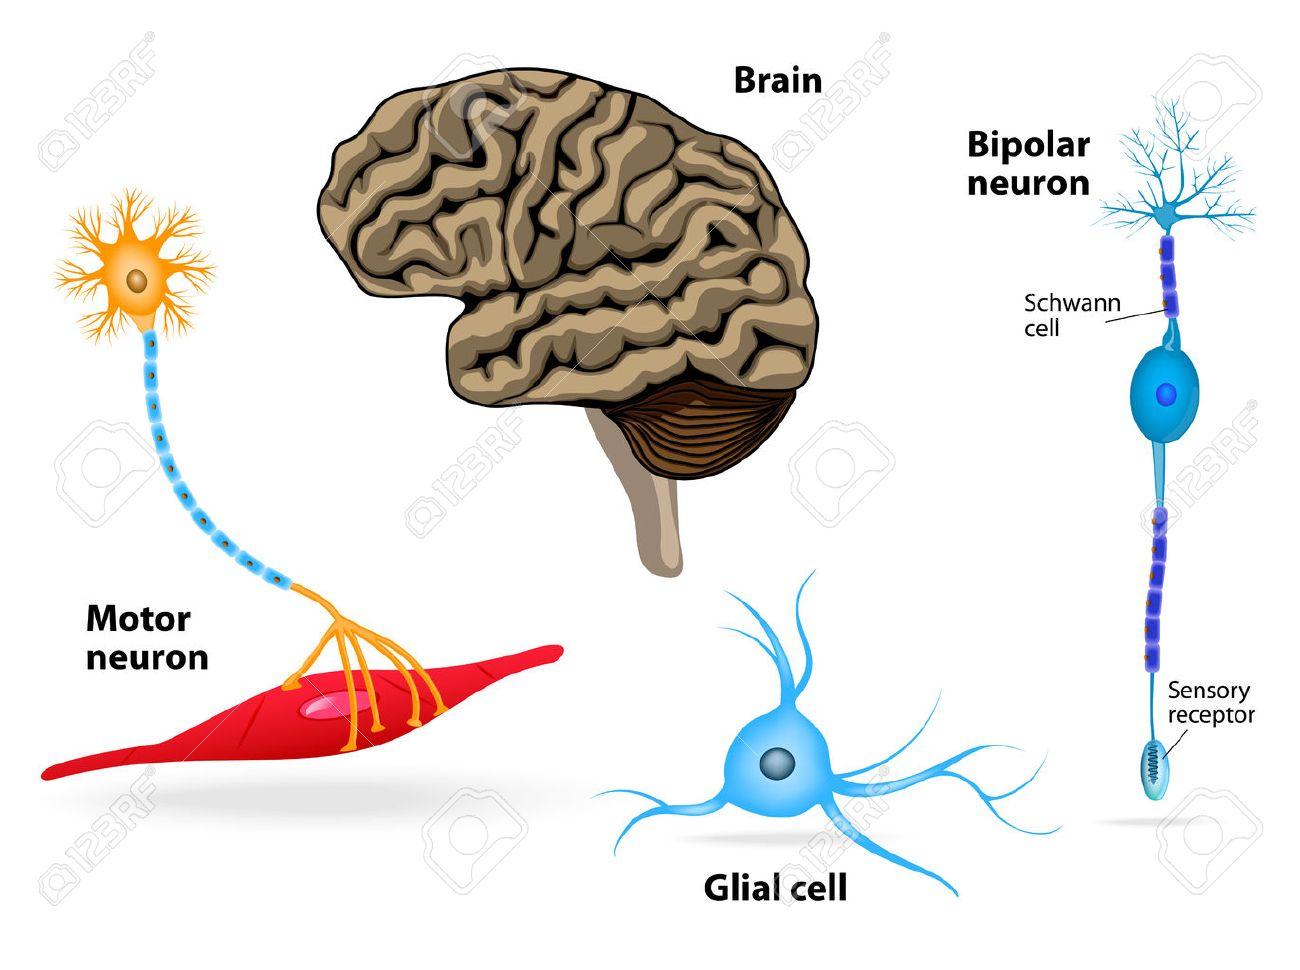 Sistema Nervioso. La Anatomía Humana. Cerebro, Las Neuronas Motoras ...